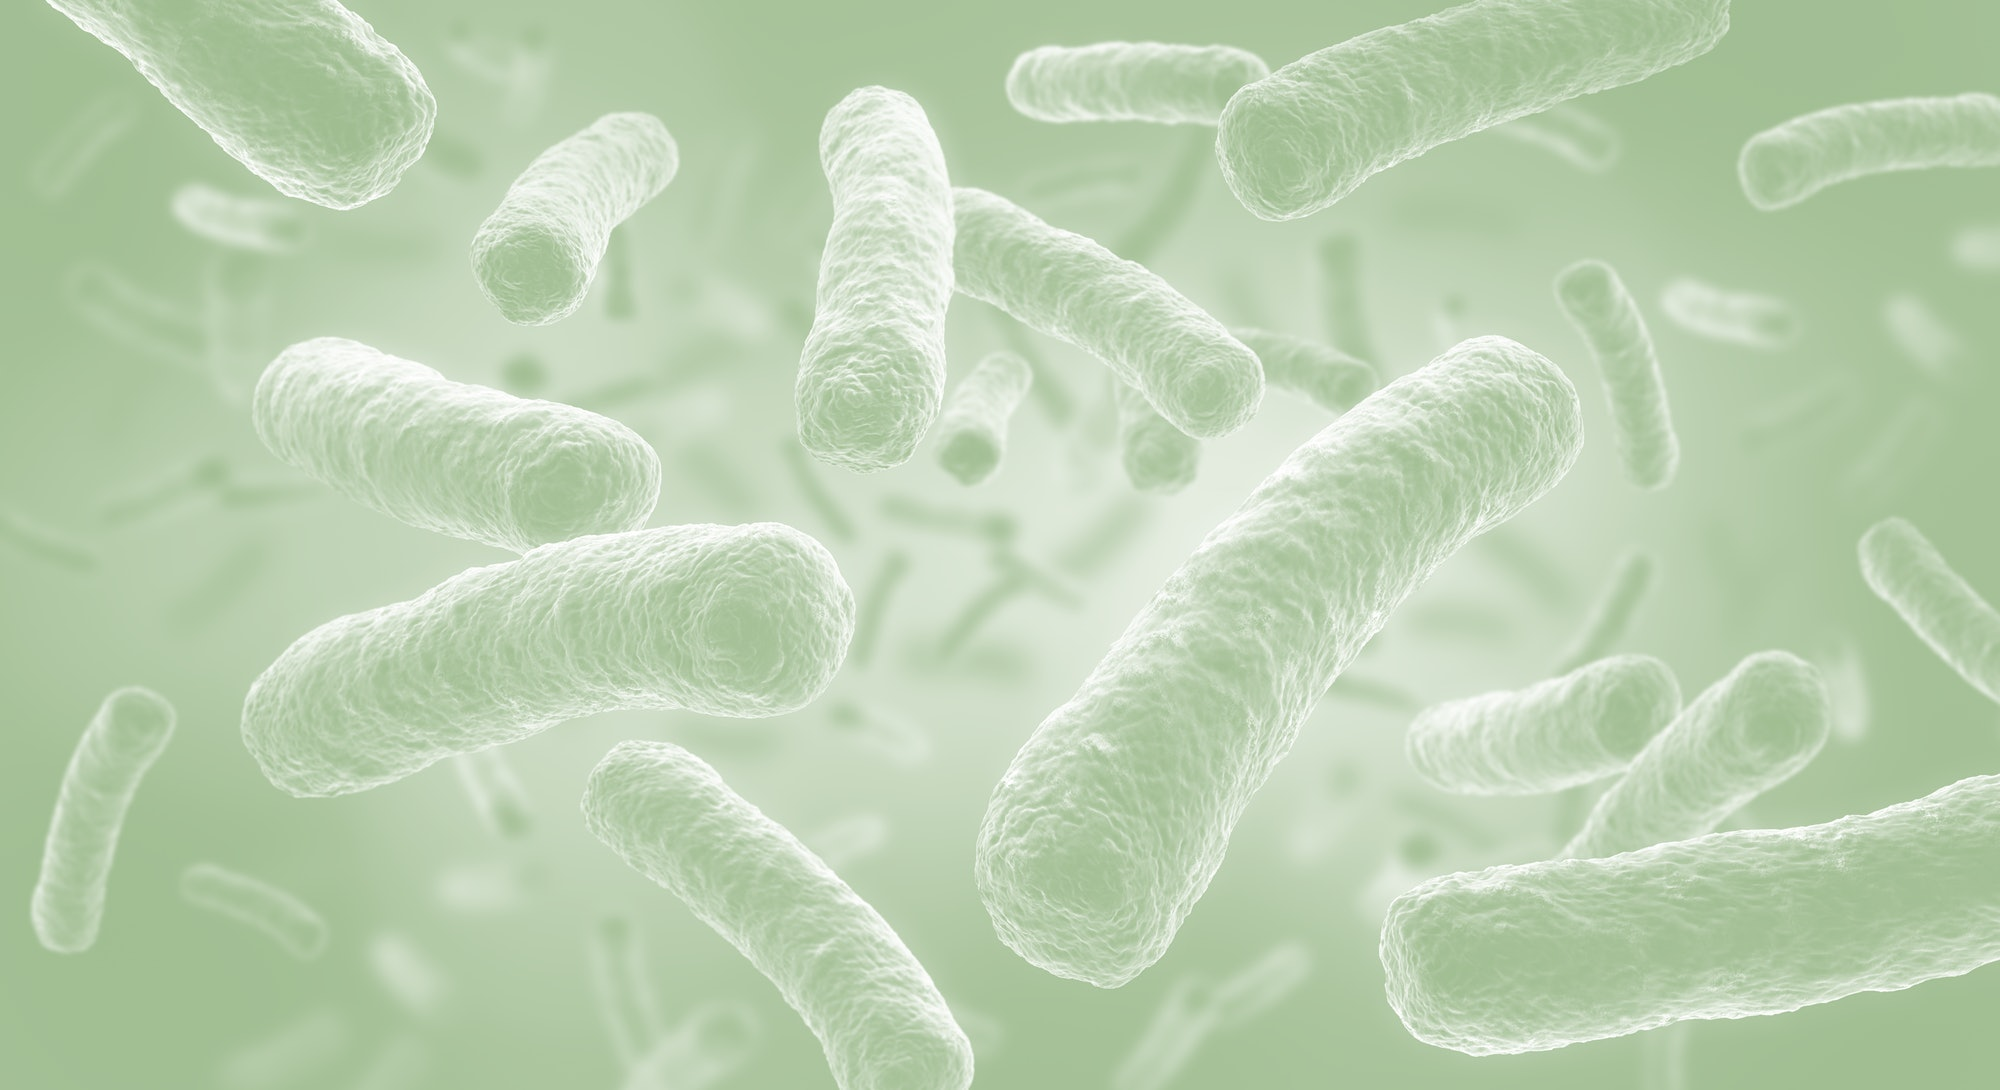 Legionella pneumophila - medical 3d illustration